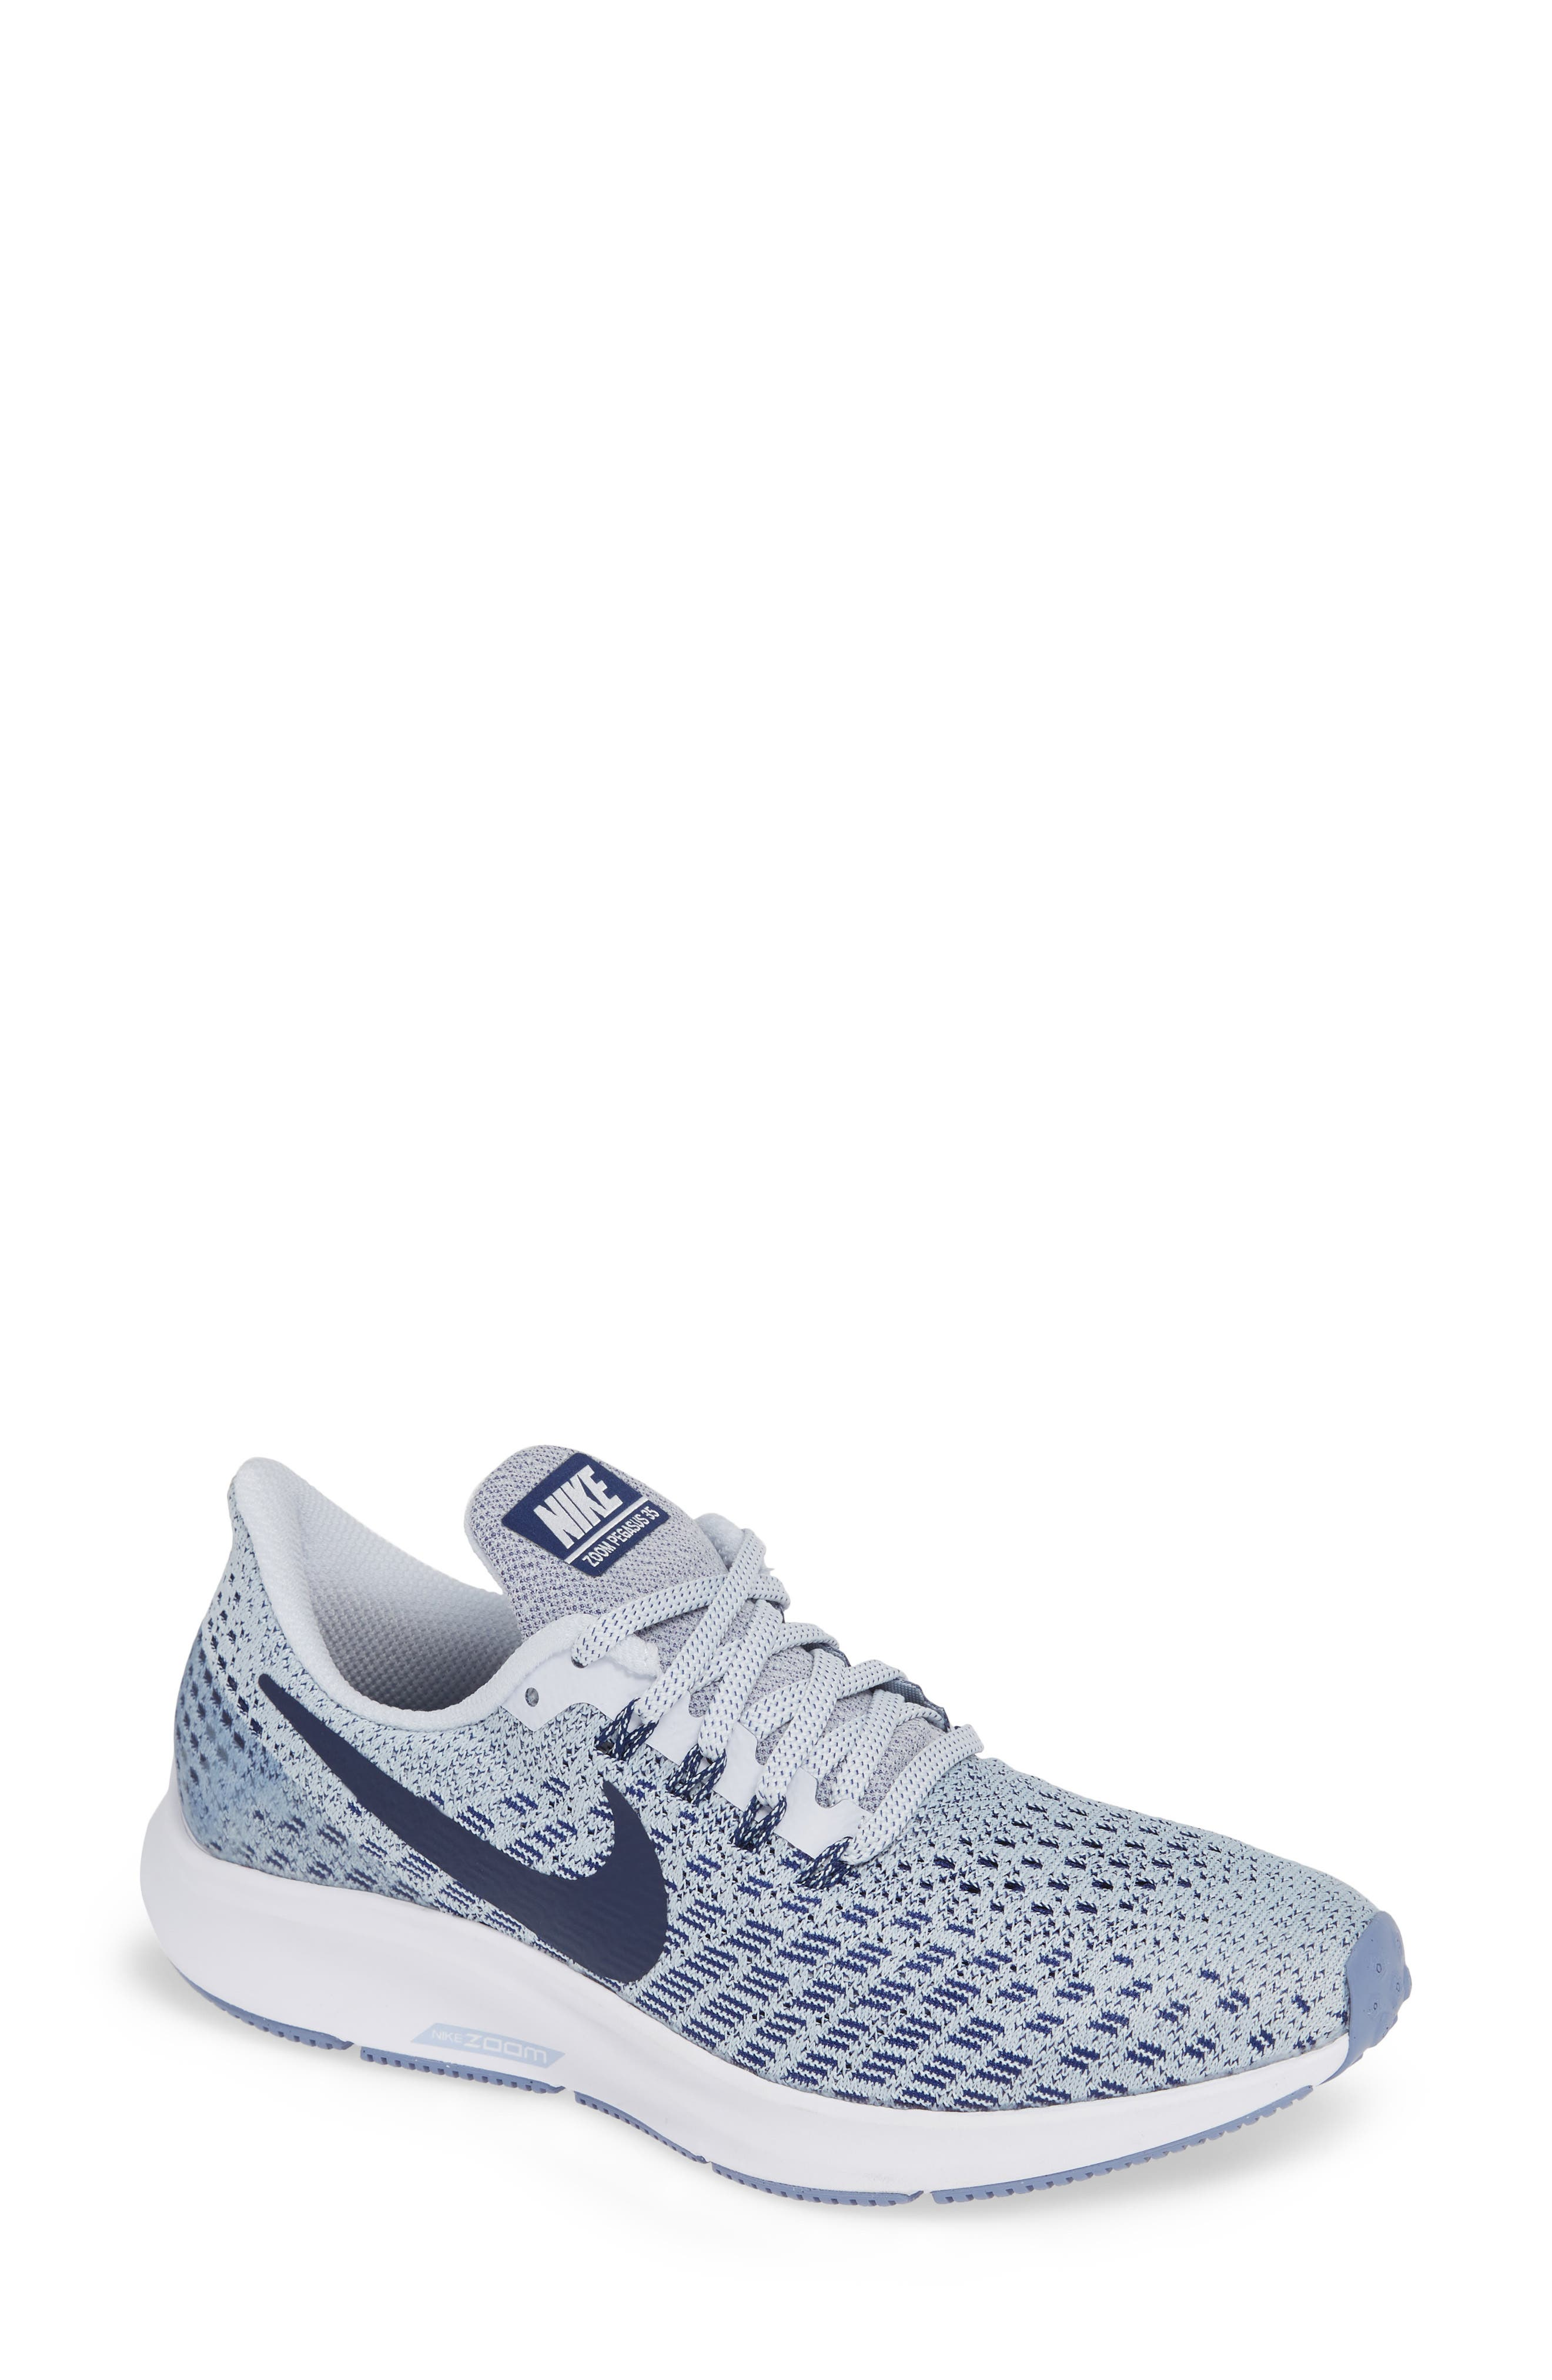 Air Zoom Pegasus 35 Running Shoe,                         Main,                         color, GREY/ BLUE/ WHITE/ ALUMINUM